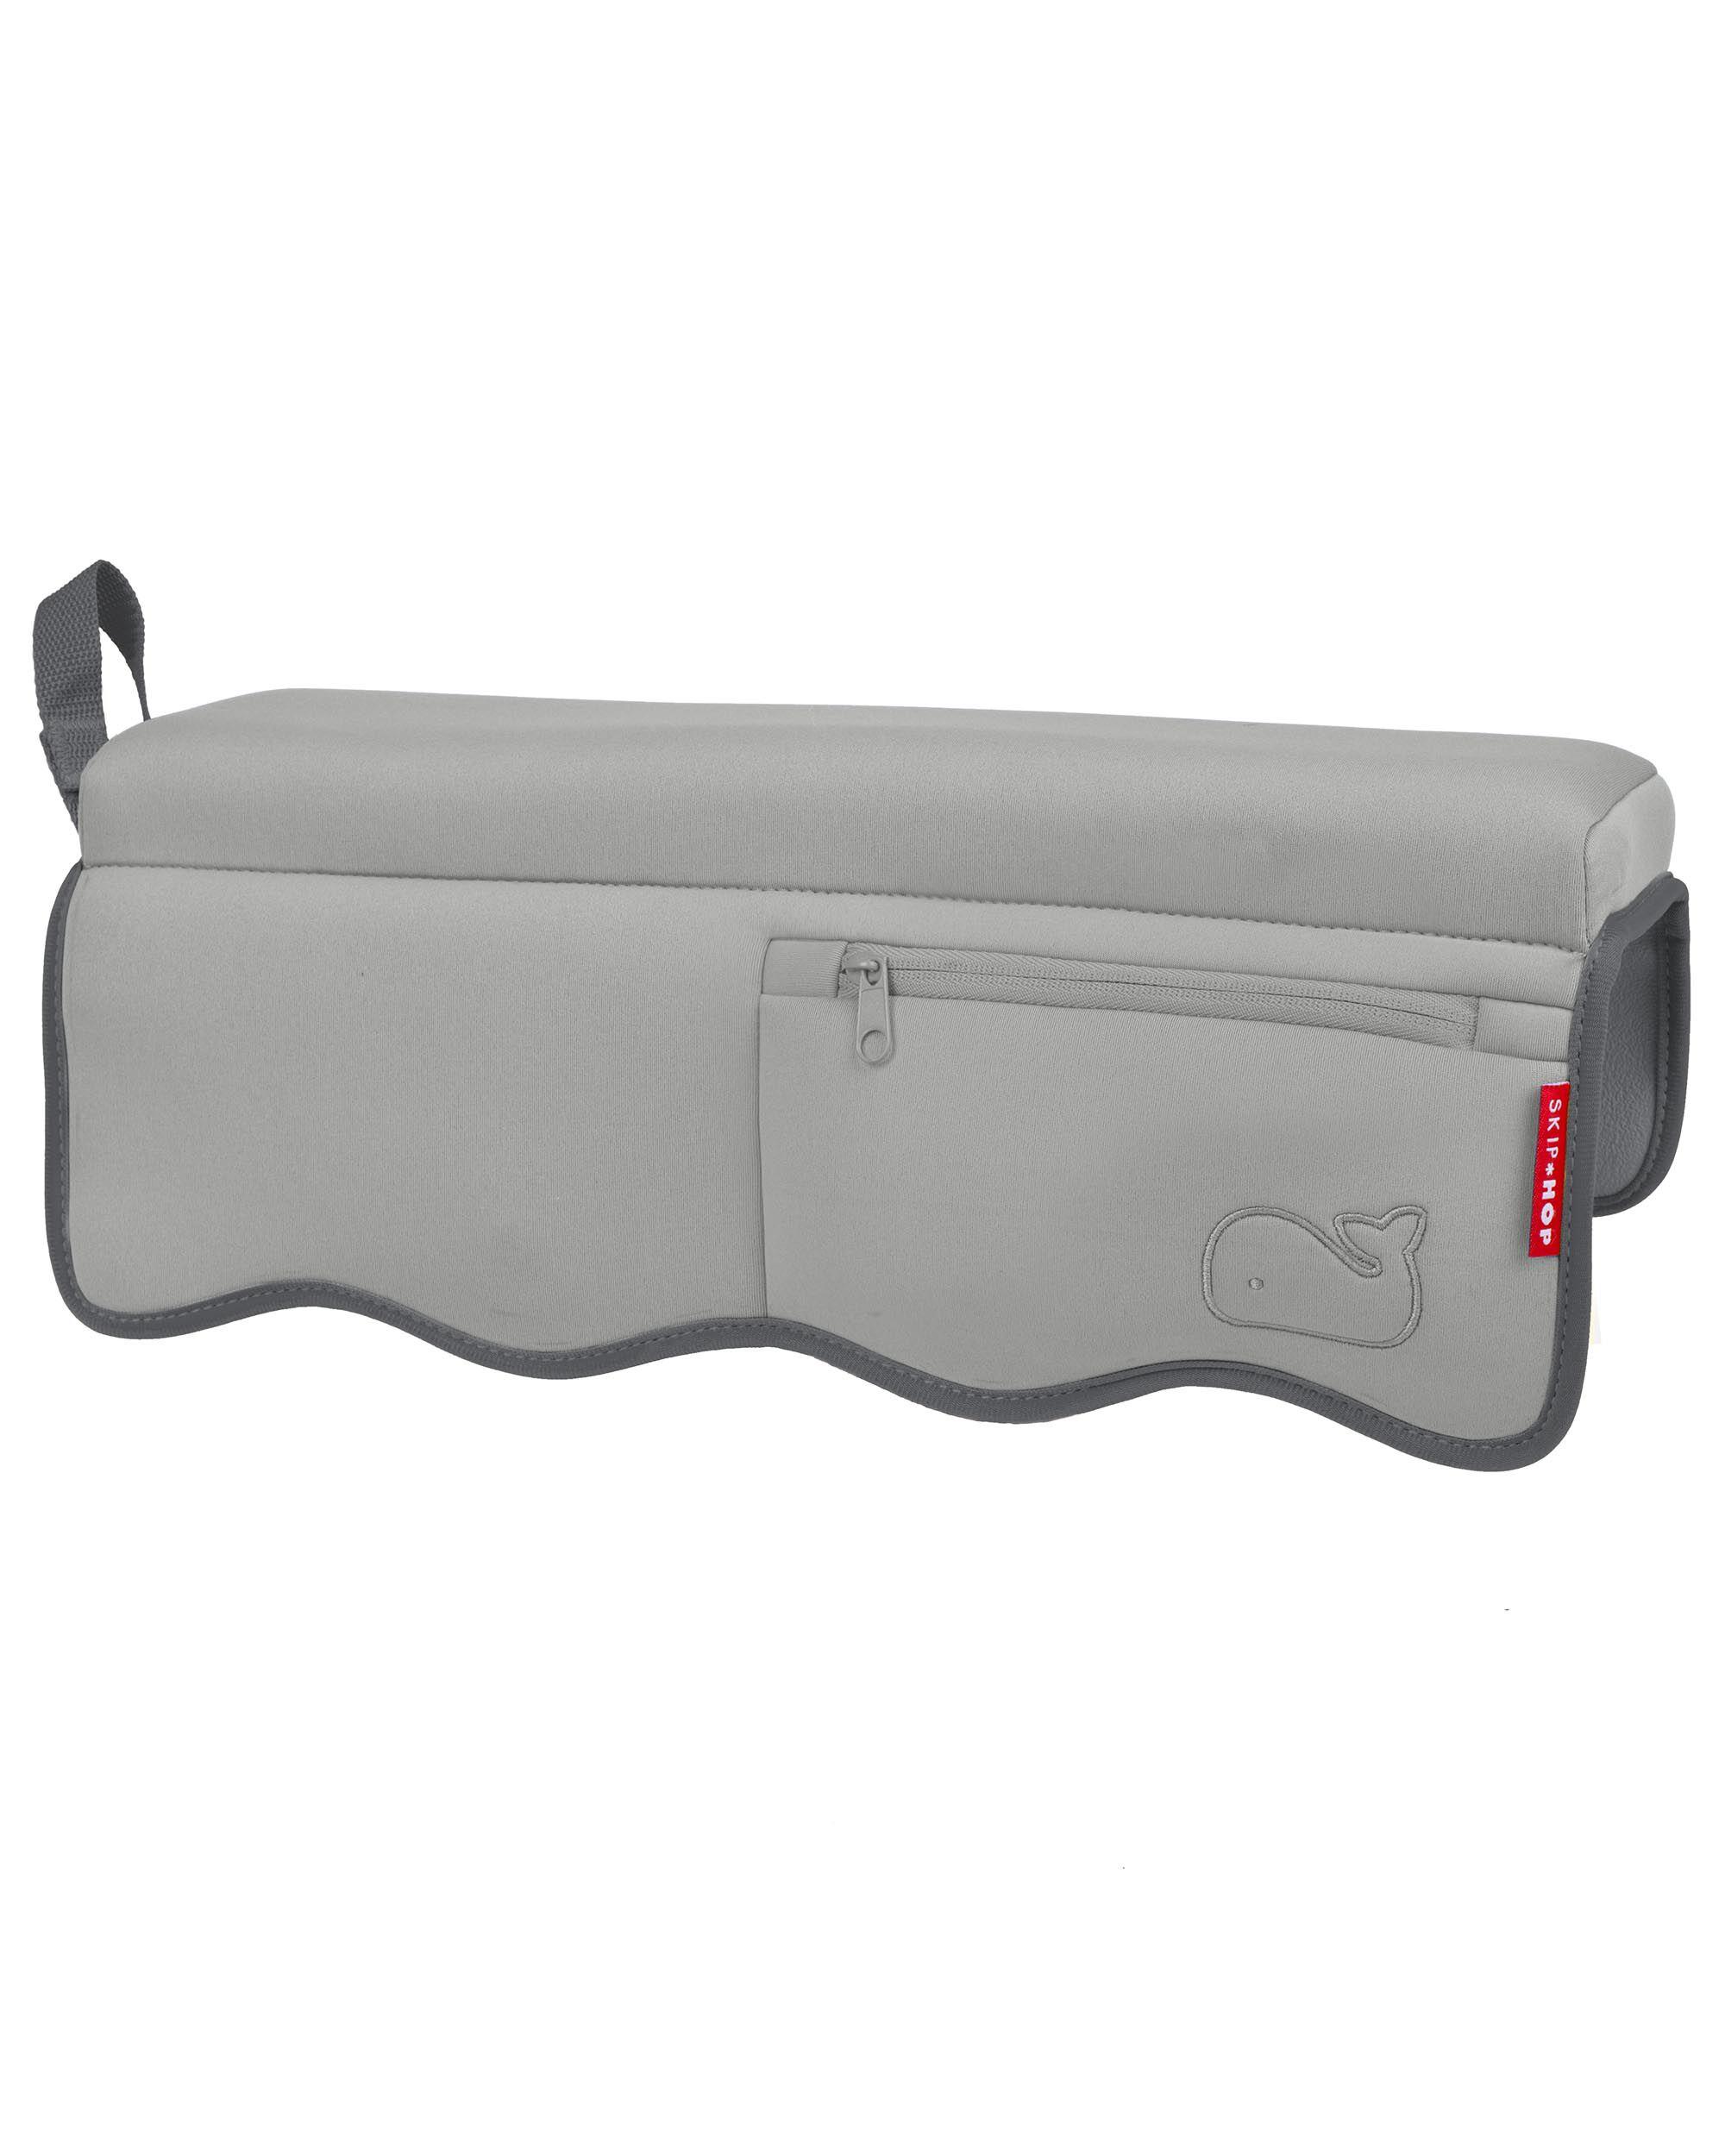 Moby Bathtub Elbow Rest - Grey | Skiphop.com